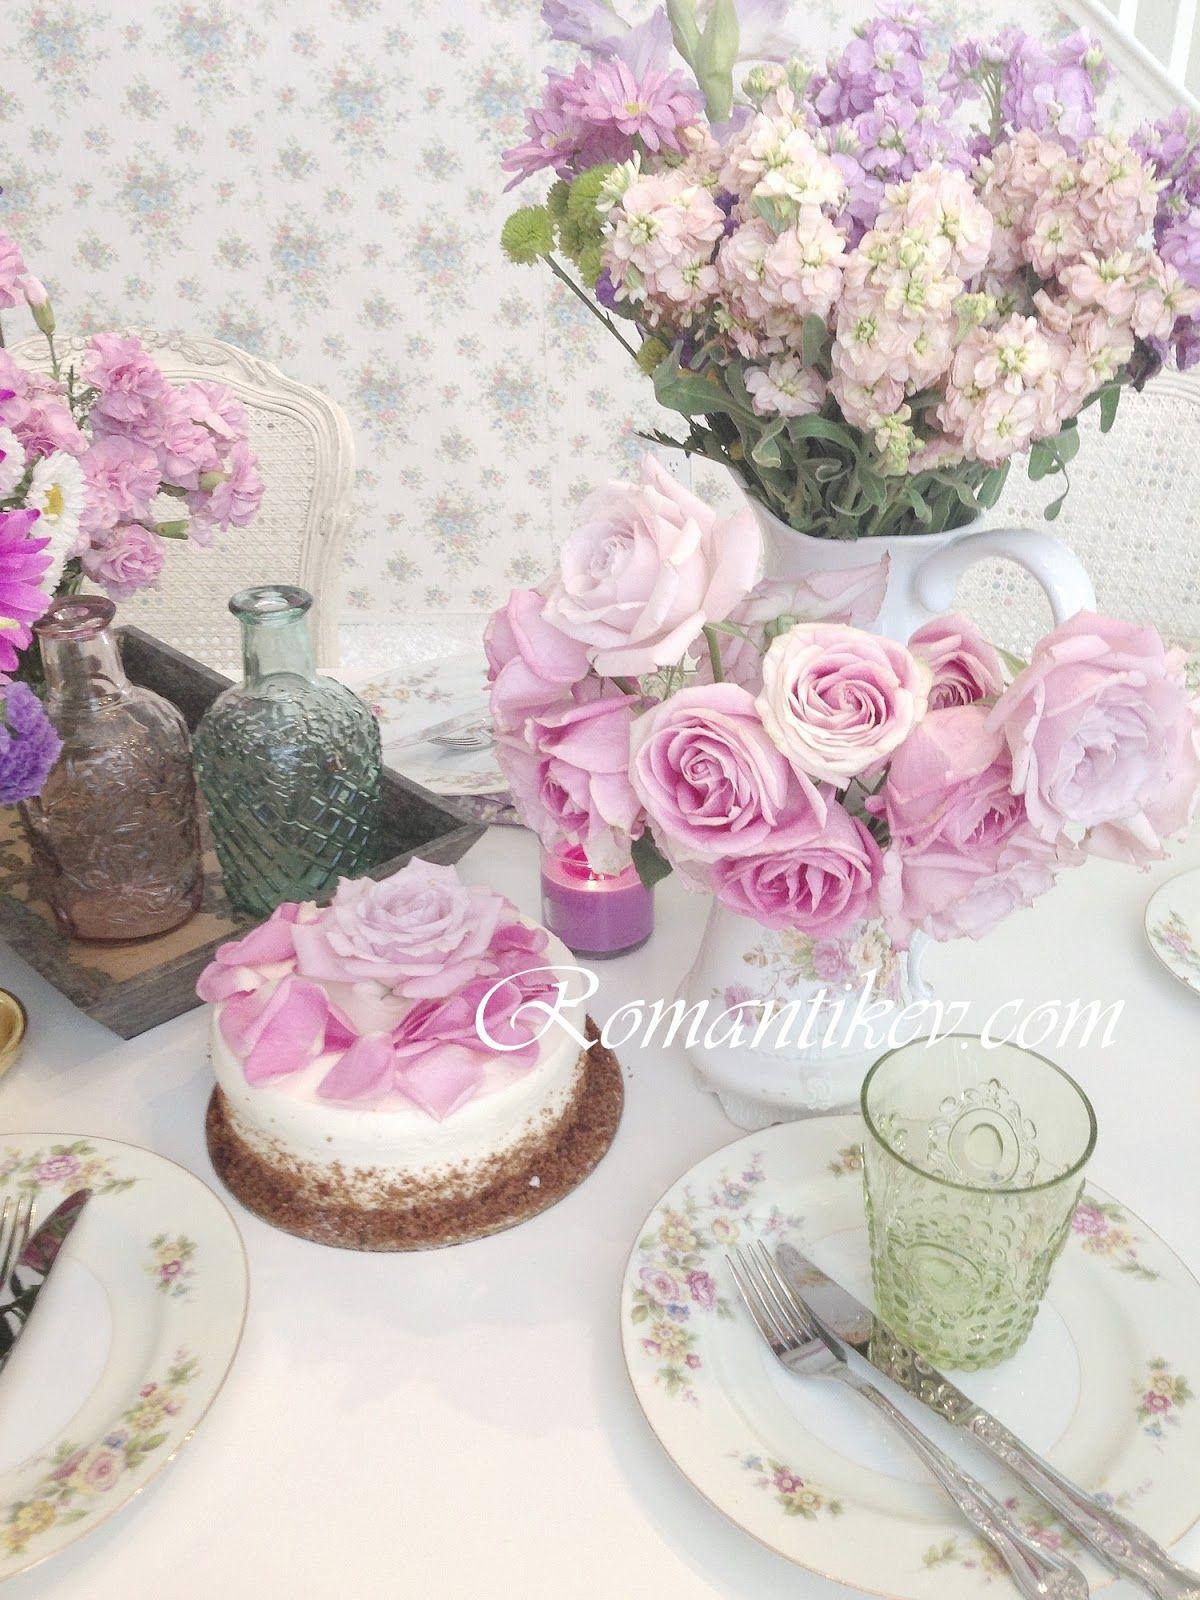 Romantikev Romantikevim Romantik ev dekorasyonu Shabby chic blog Magical times